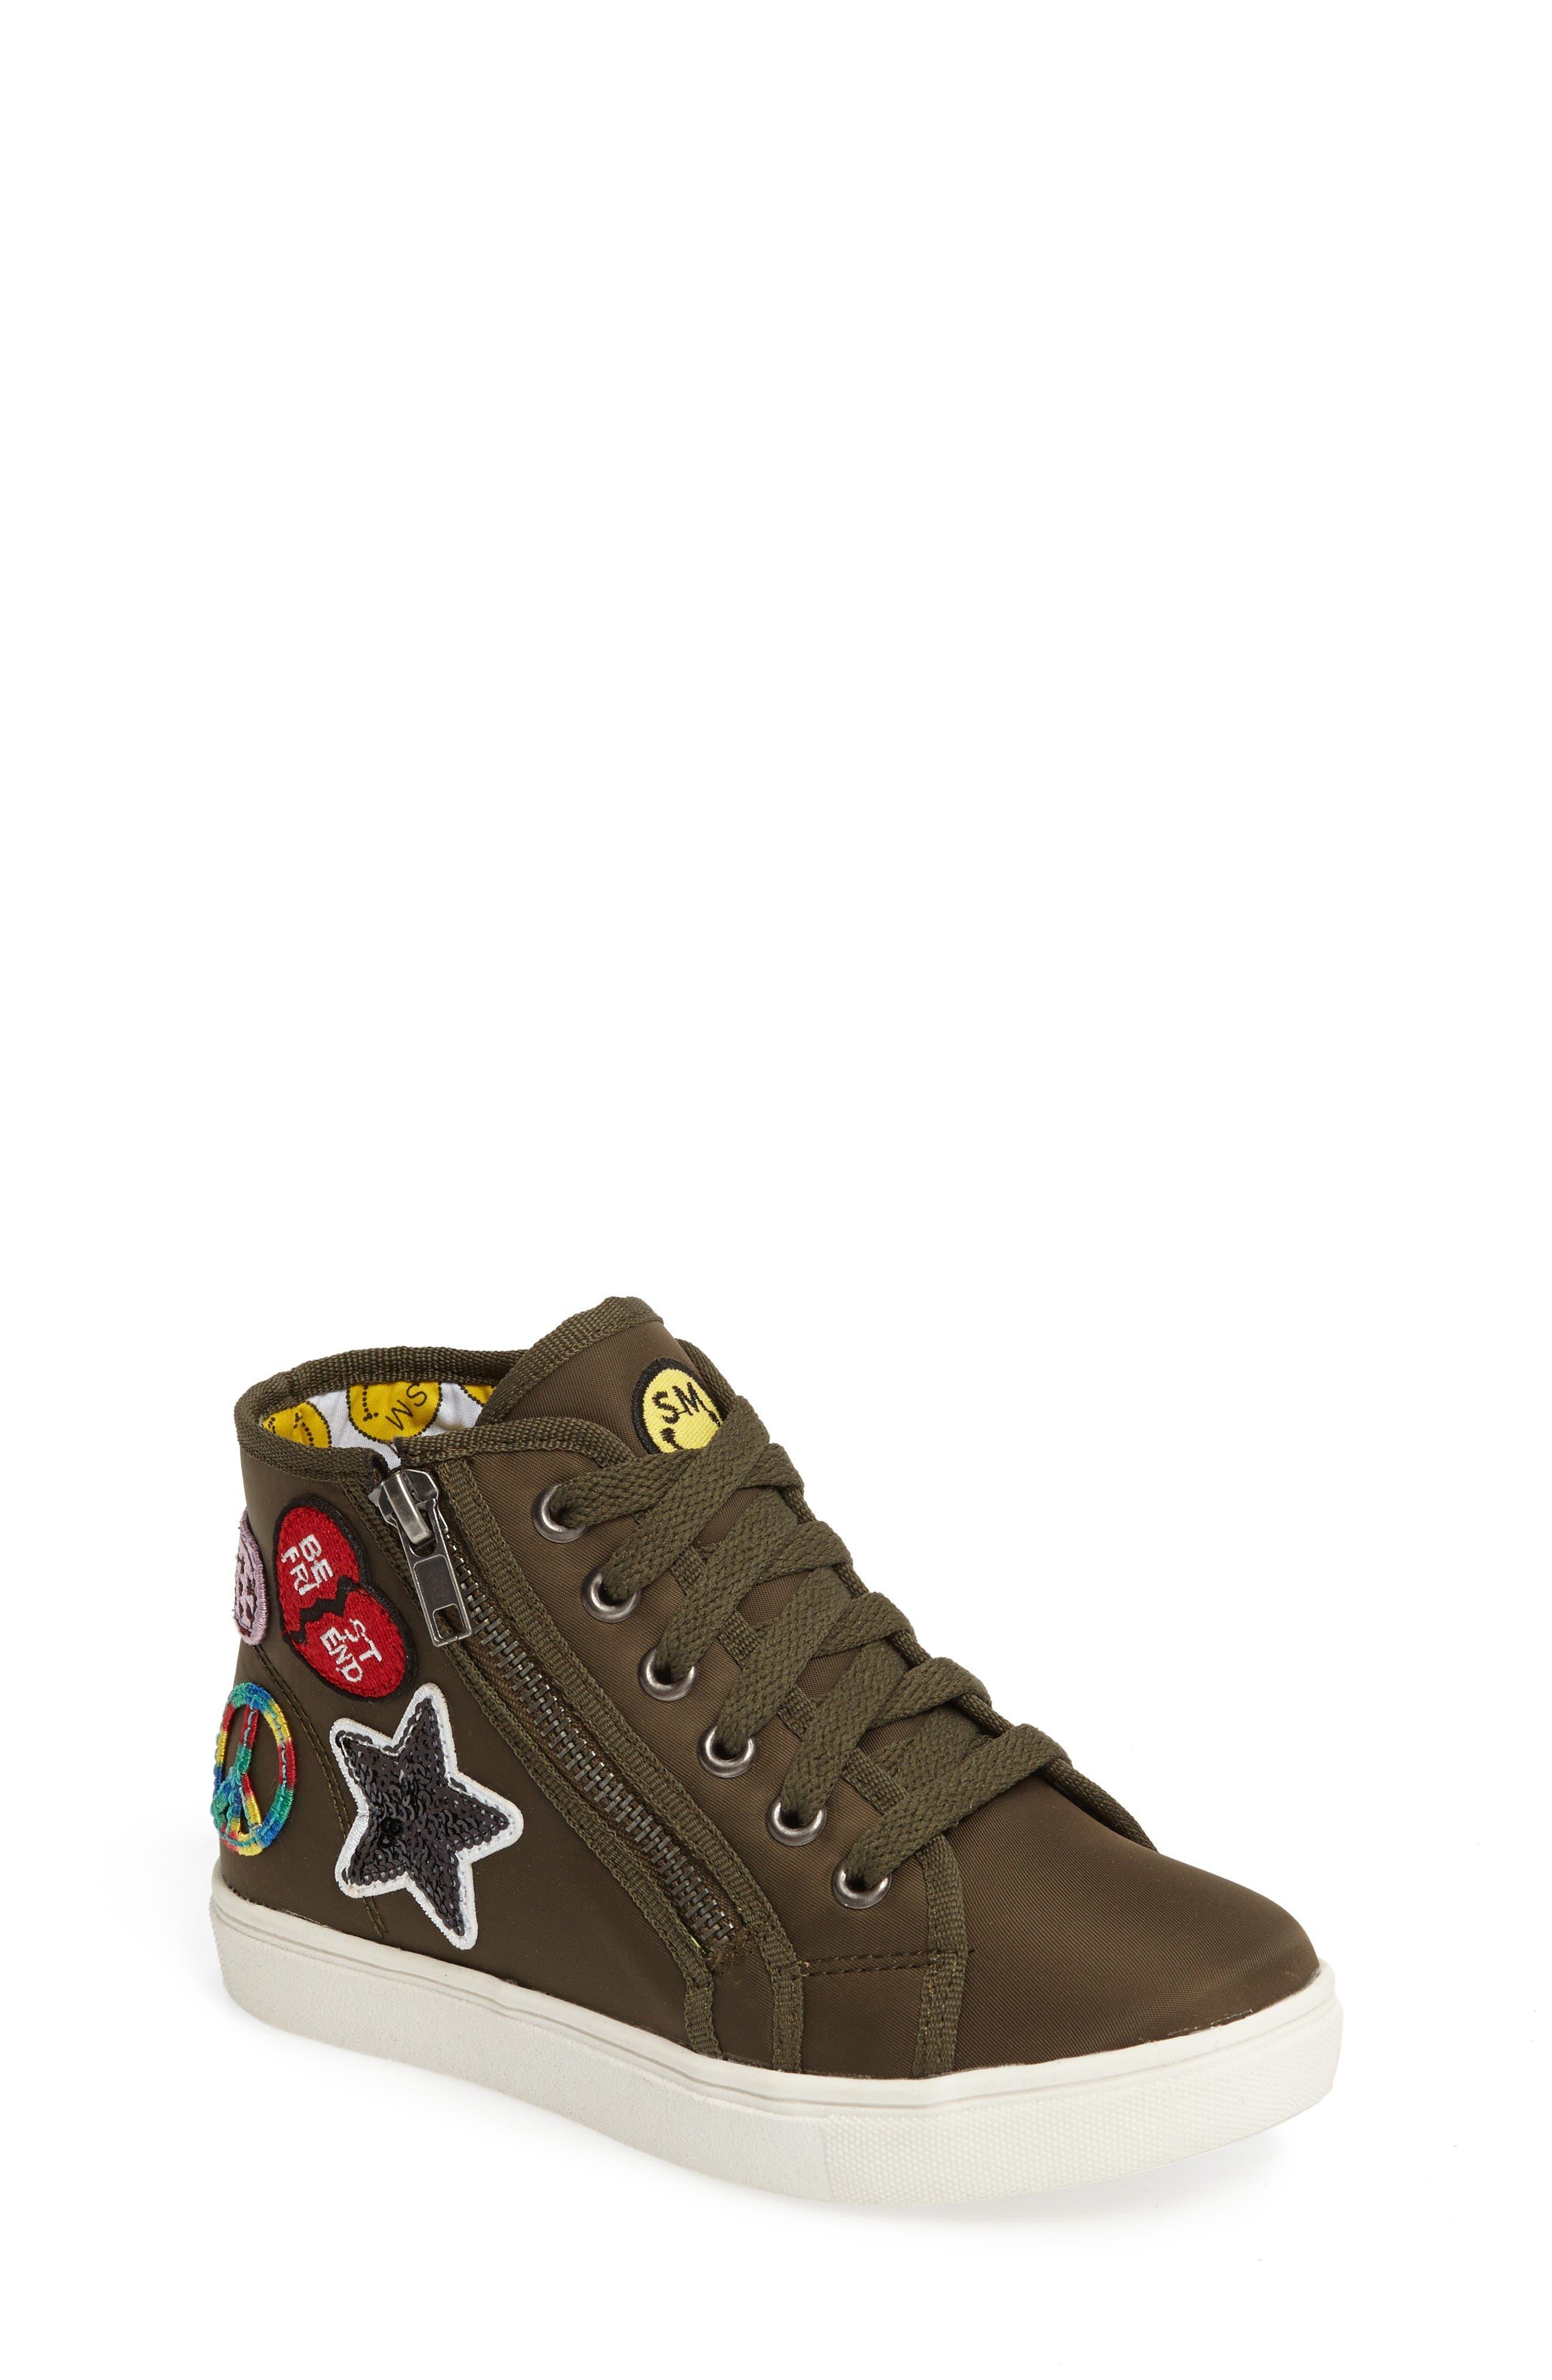 Main Image - Steve Madden Code High Top Zip Sneaker (Toddler, Little Kid & Big Kid)